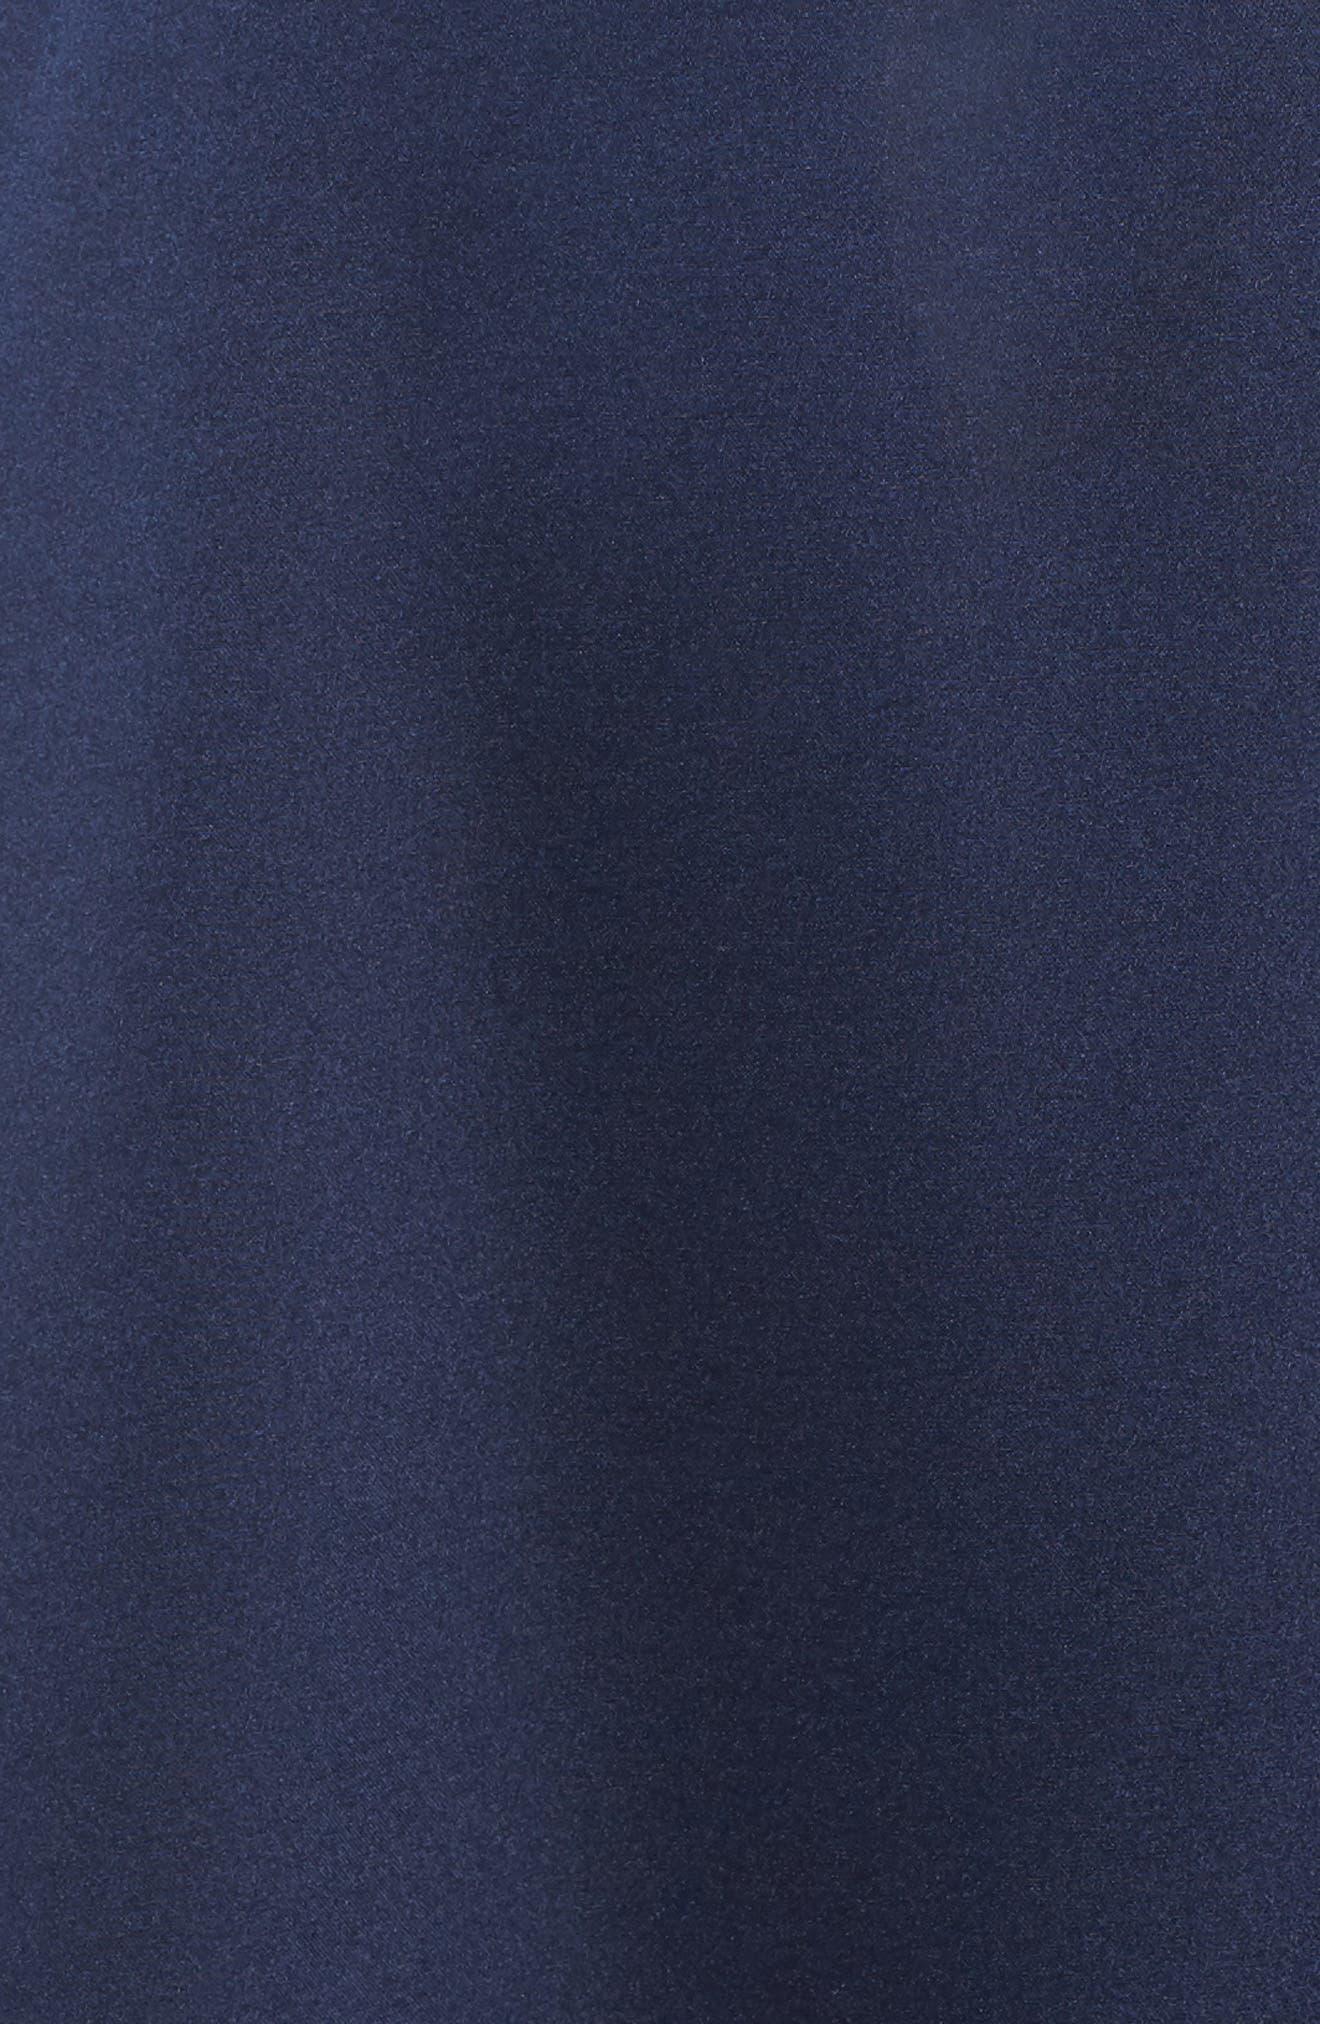 Marilyn Satin Faux Wrap Dress,                             Alternate thumbnail 6, color,                             NAVY